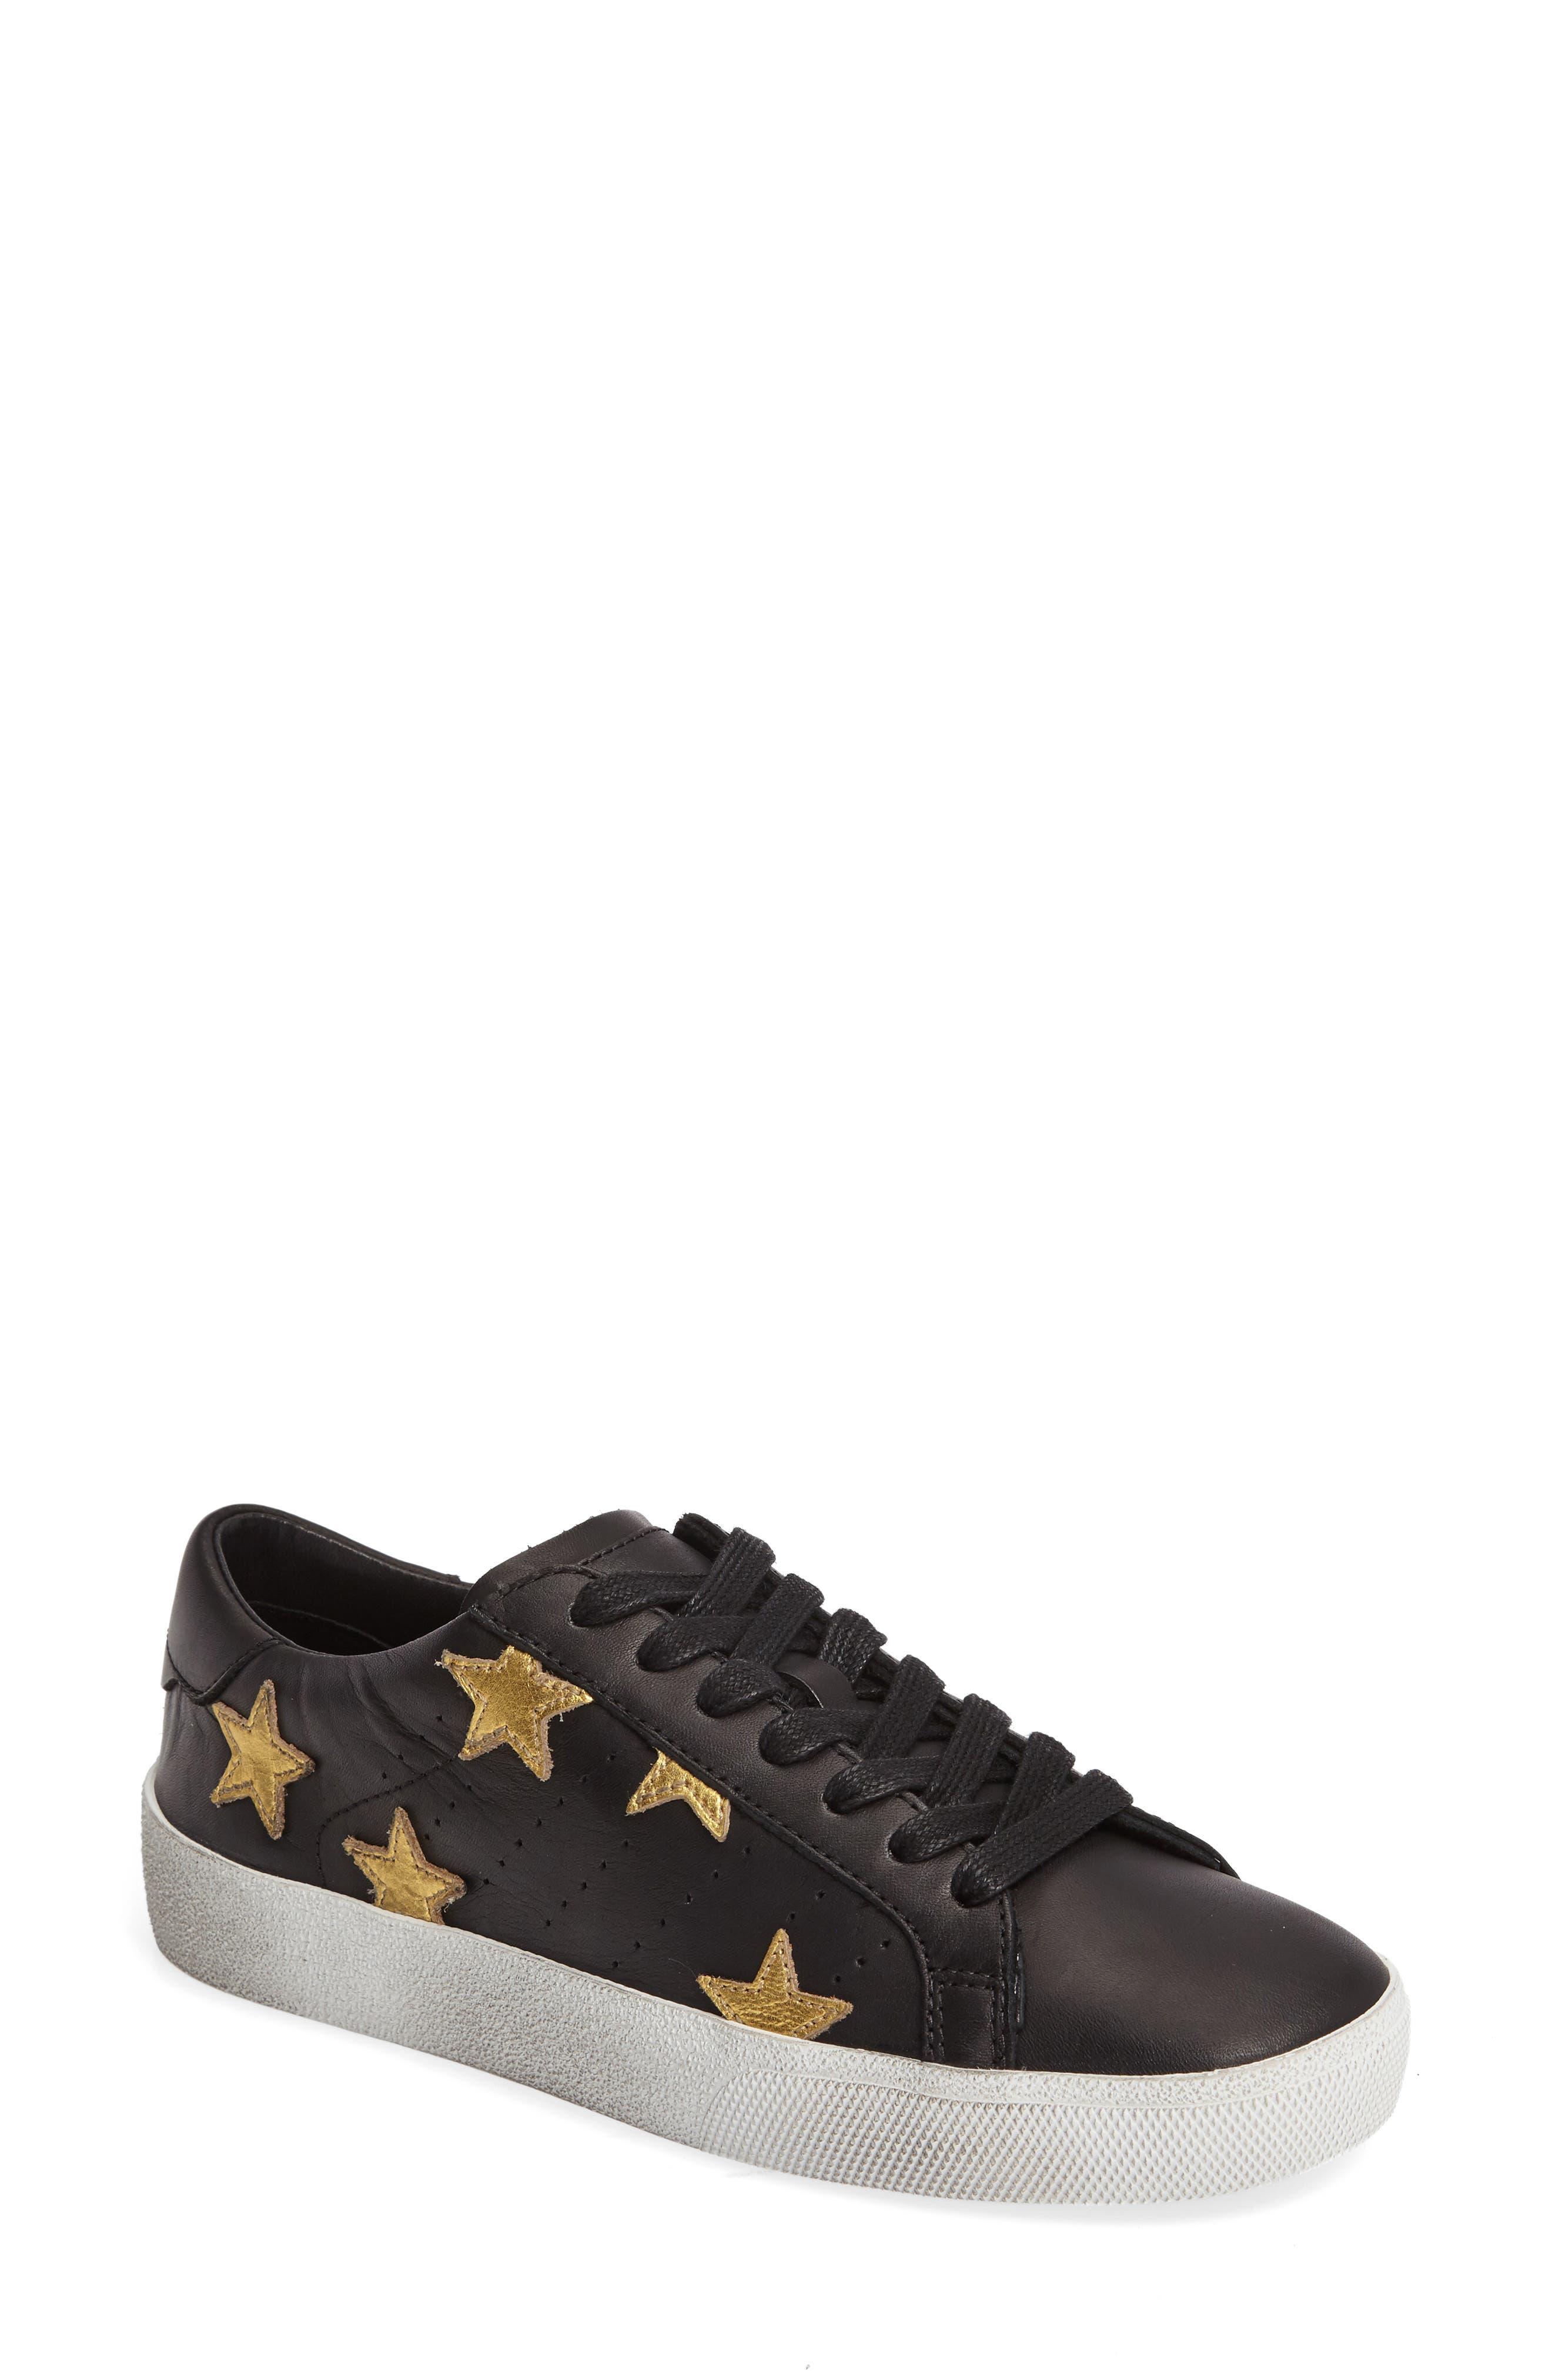 Callback Star Sneaker,                             Main thumbnail 1, color,                             002